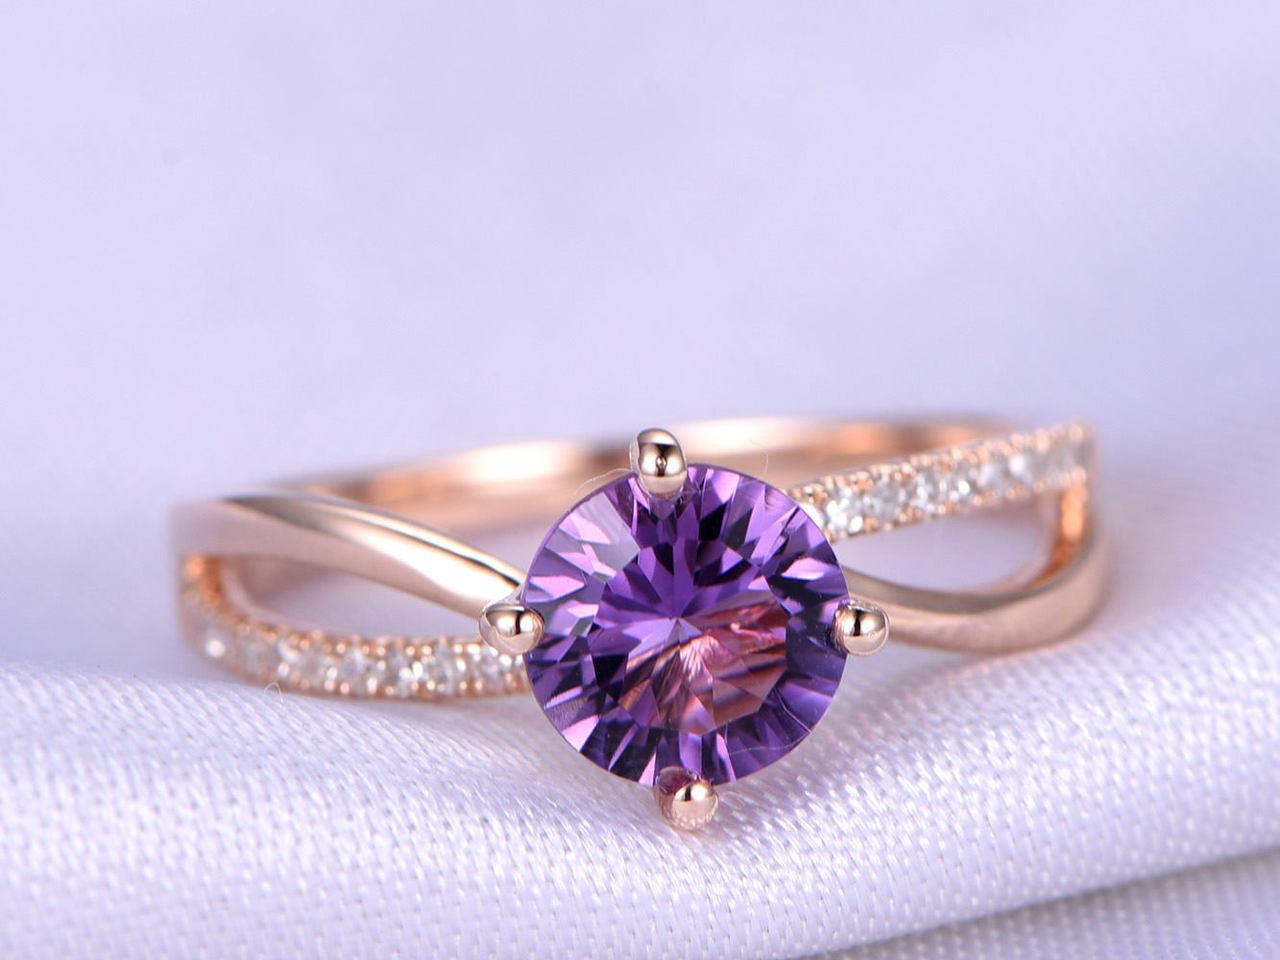 https://www.bbbgem.com/6-5mm-amethyst-solitaire-engagement-ring-rose-gold-split-shank-mile-ring234/